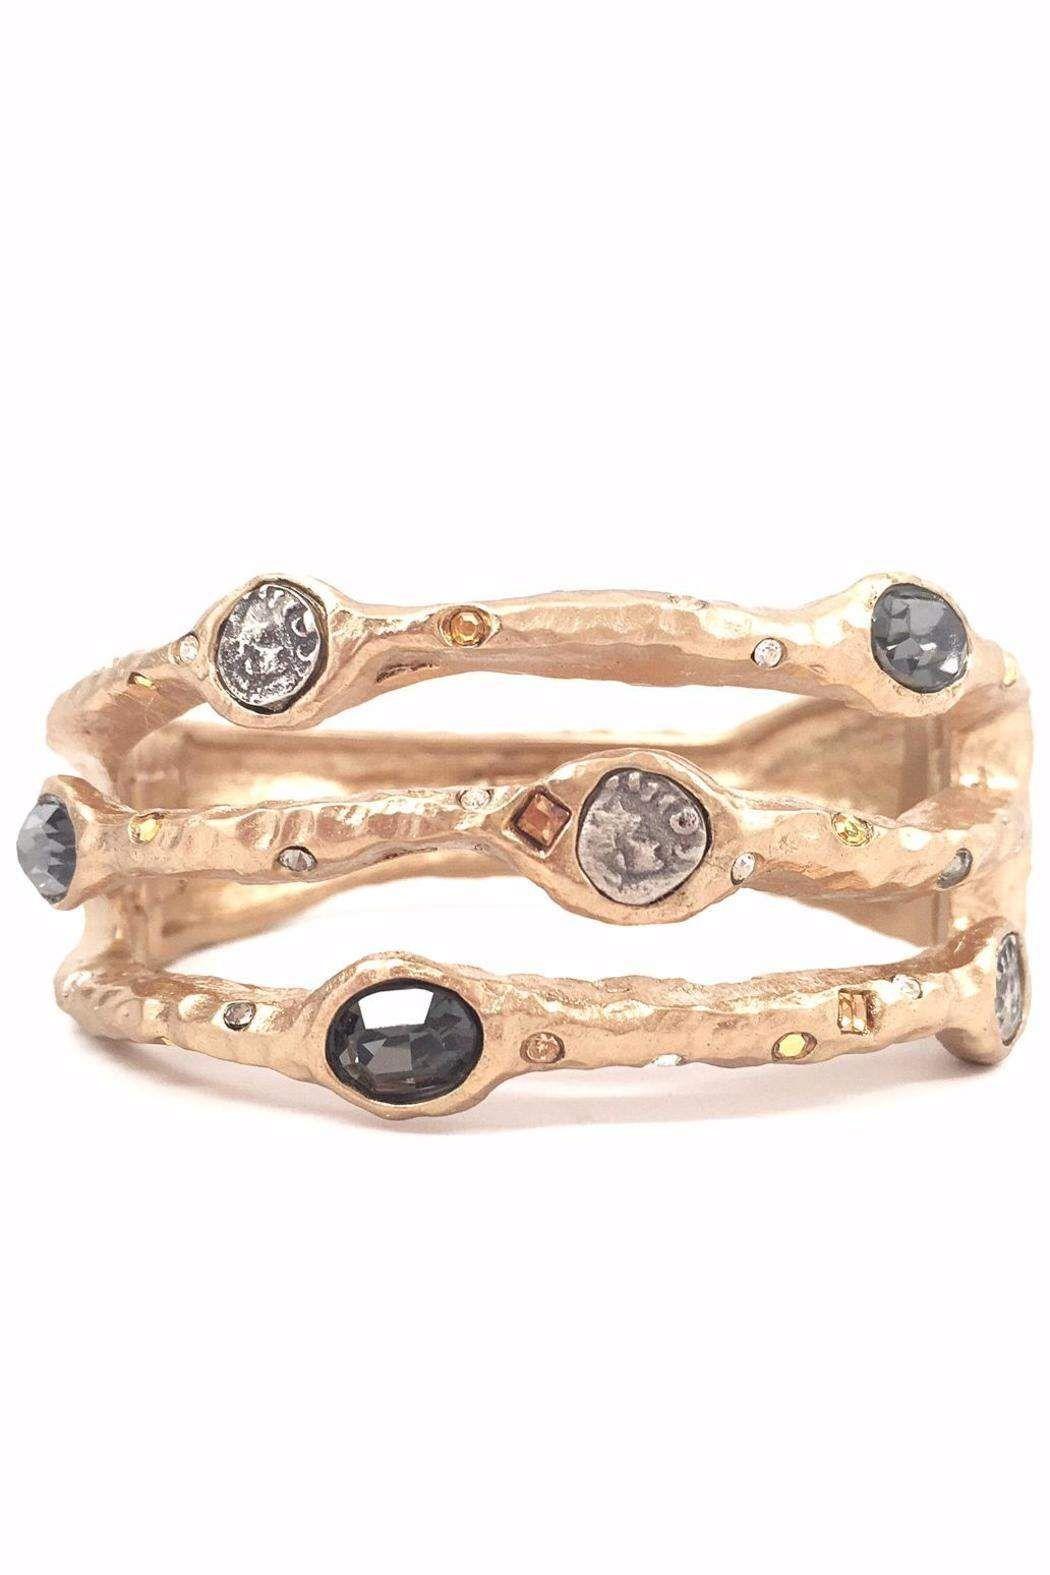 Tat gold bangle sprung hinges gold bangles and black diamonds